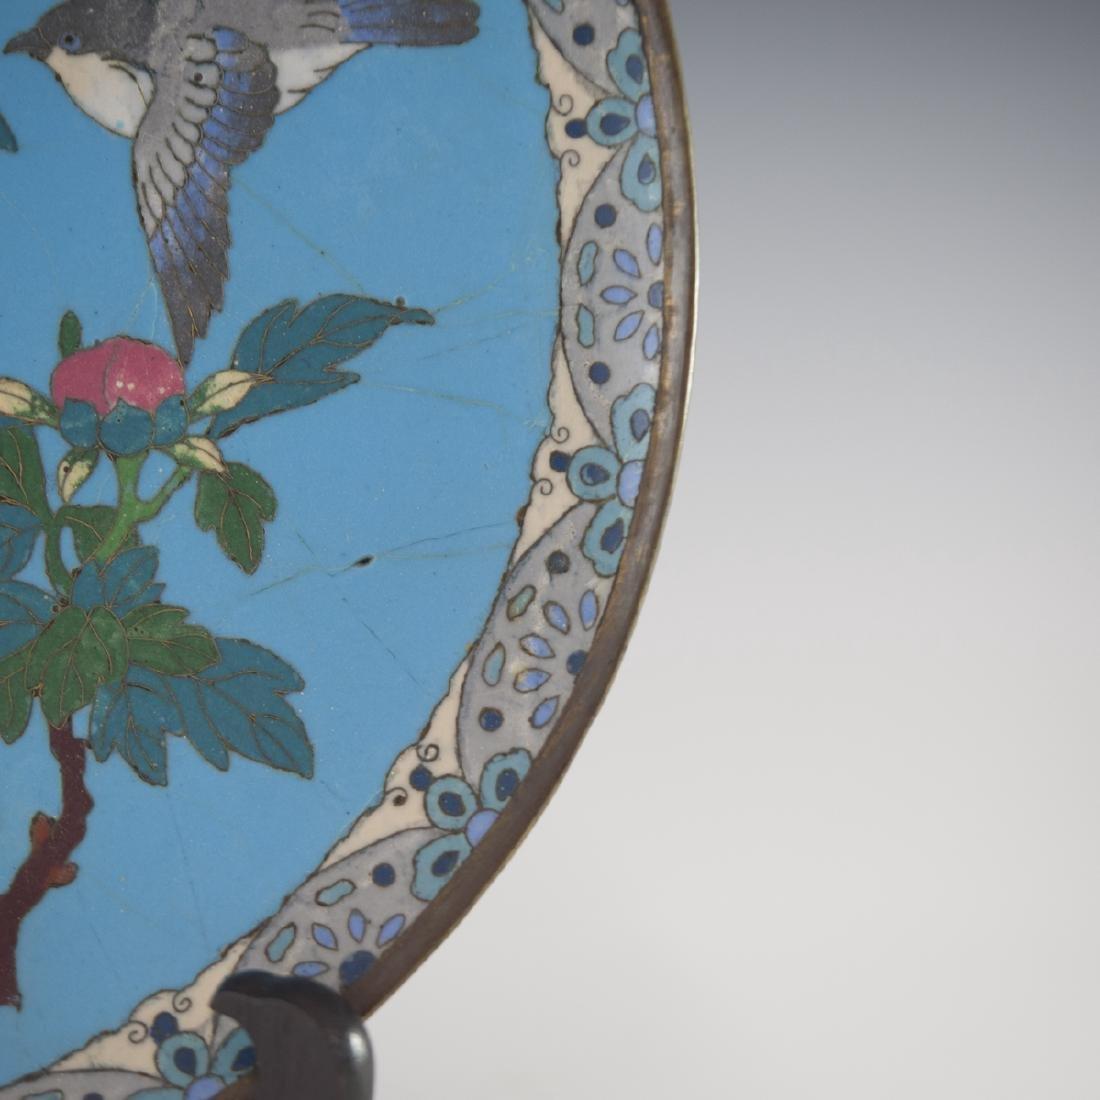 Antique Japanese Cloisonne Enameled Plate - 3